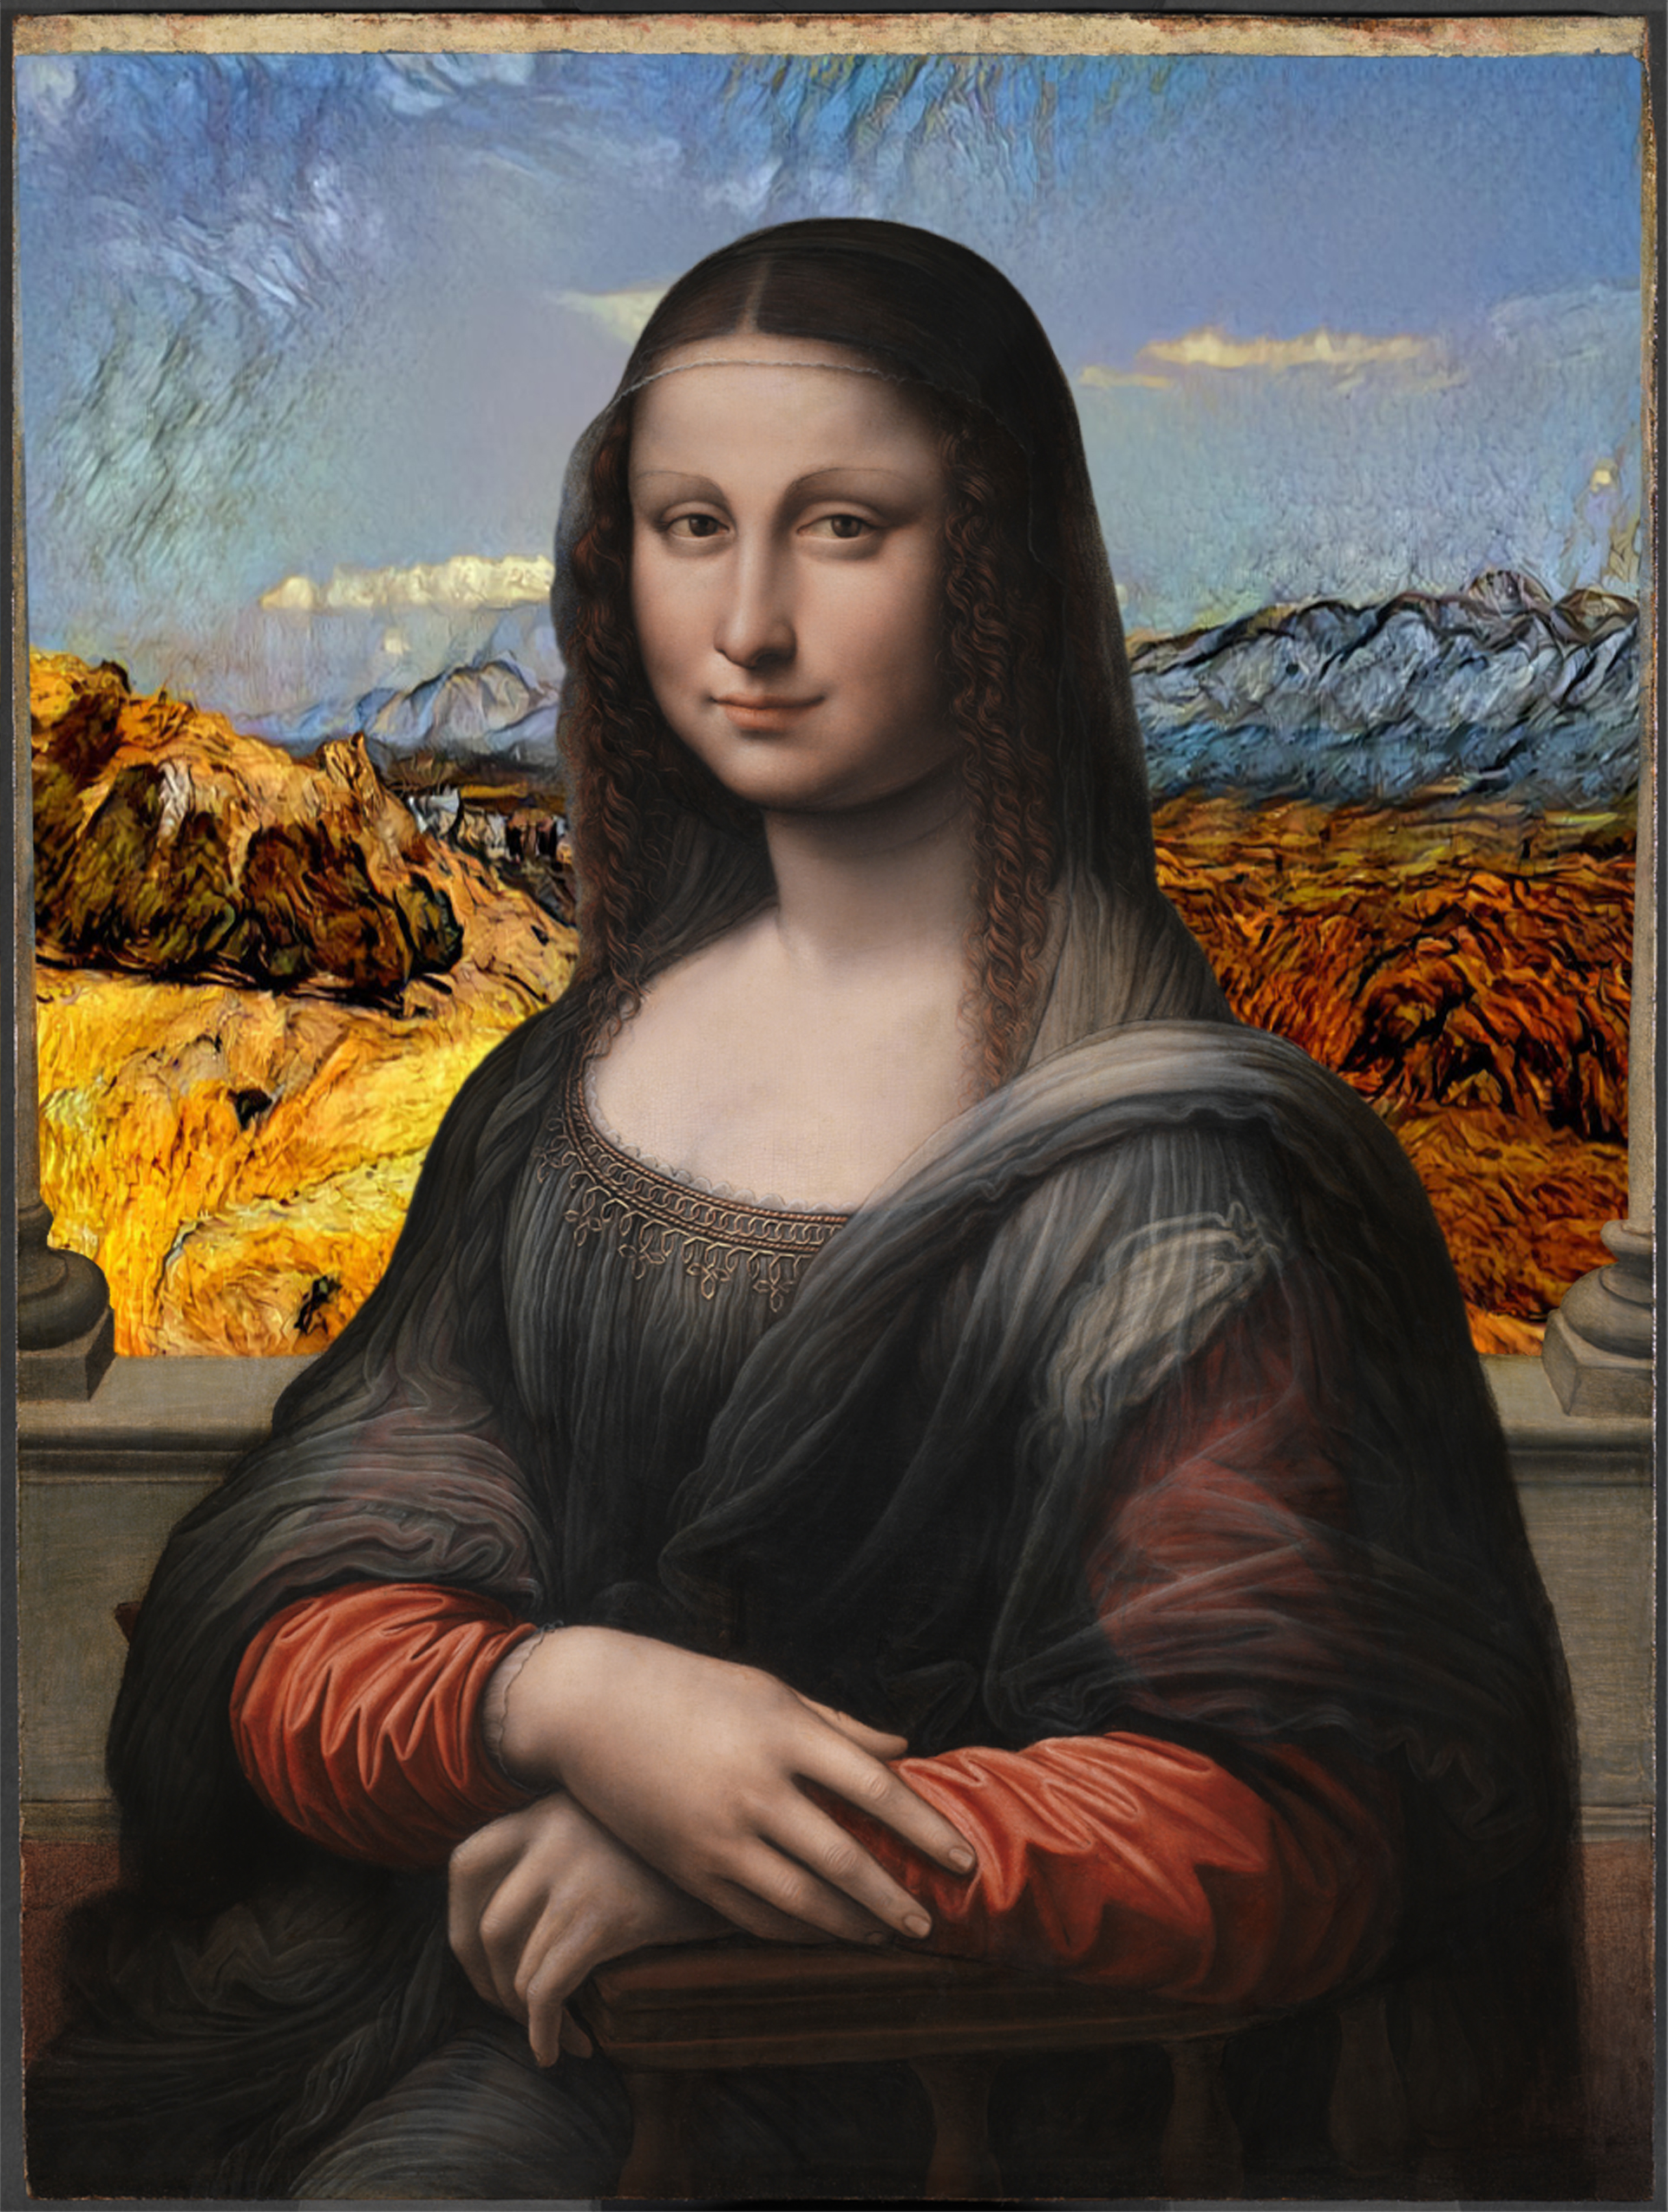 La Monalisa Lmac 1.jpg